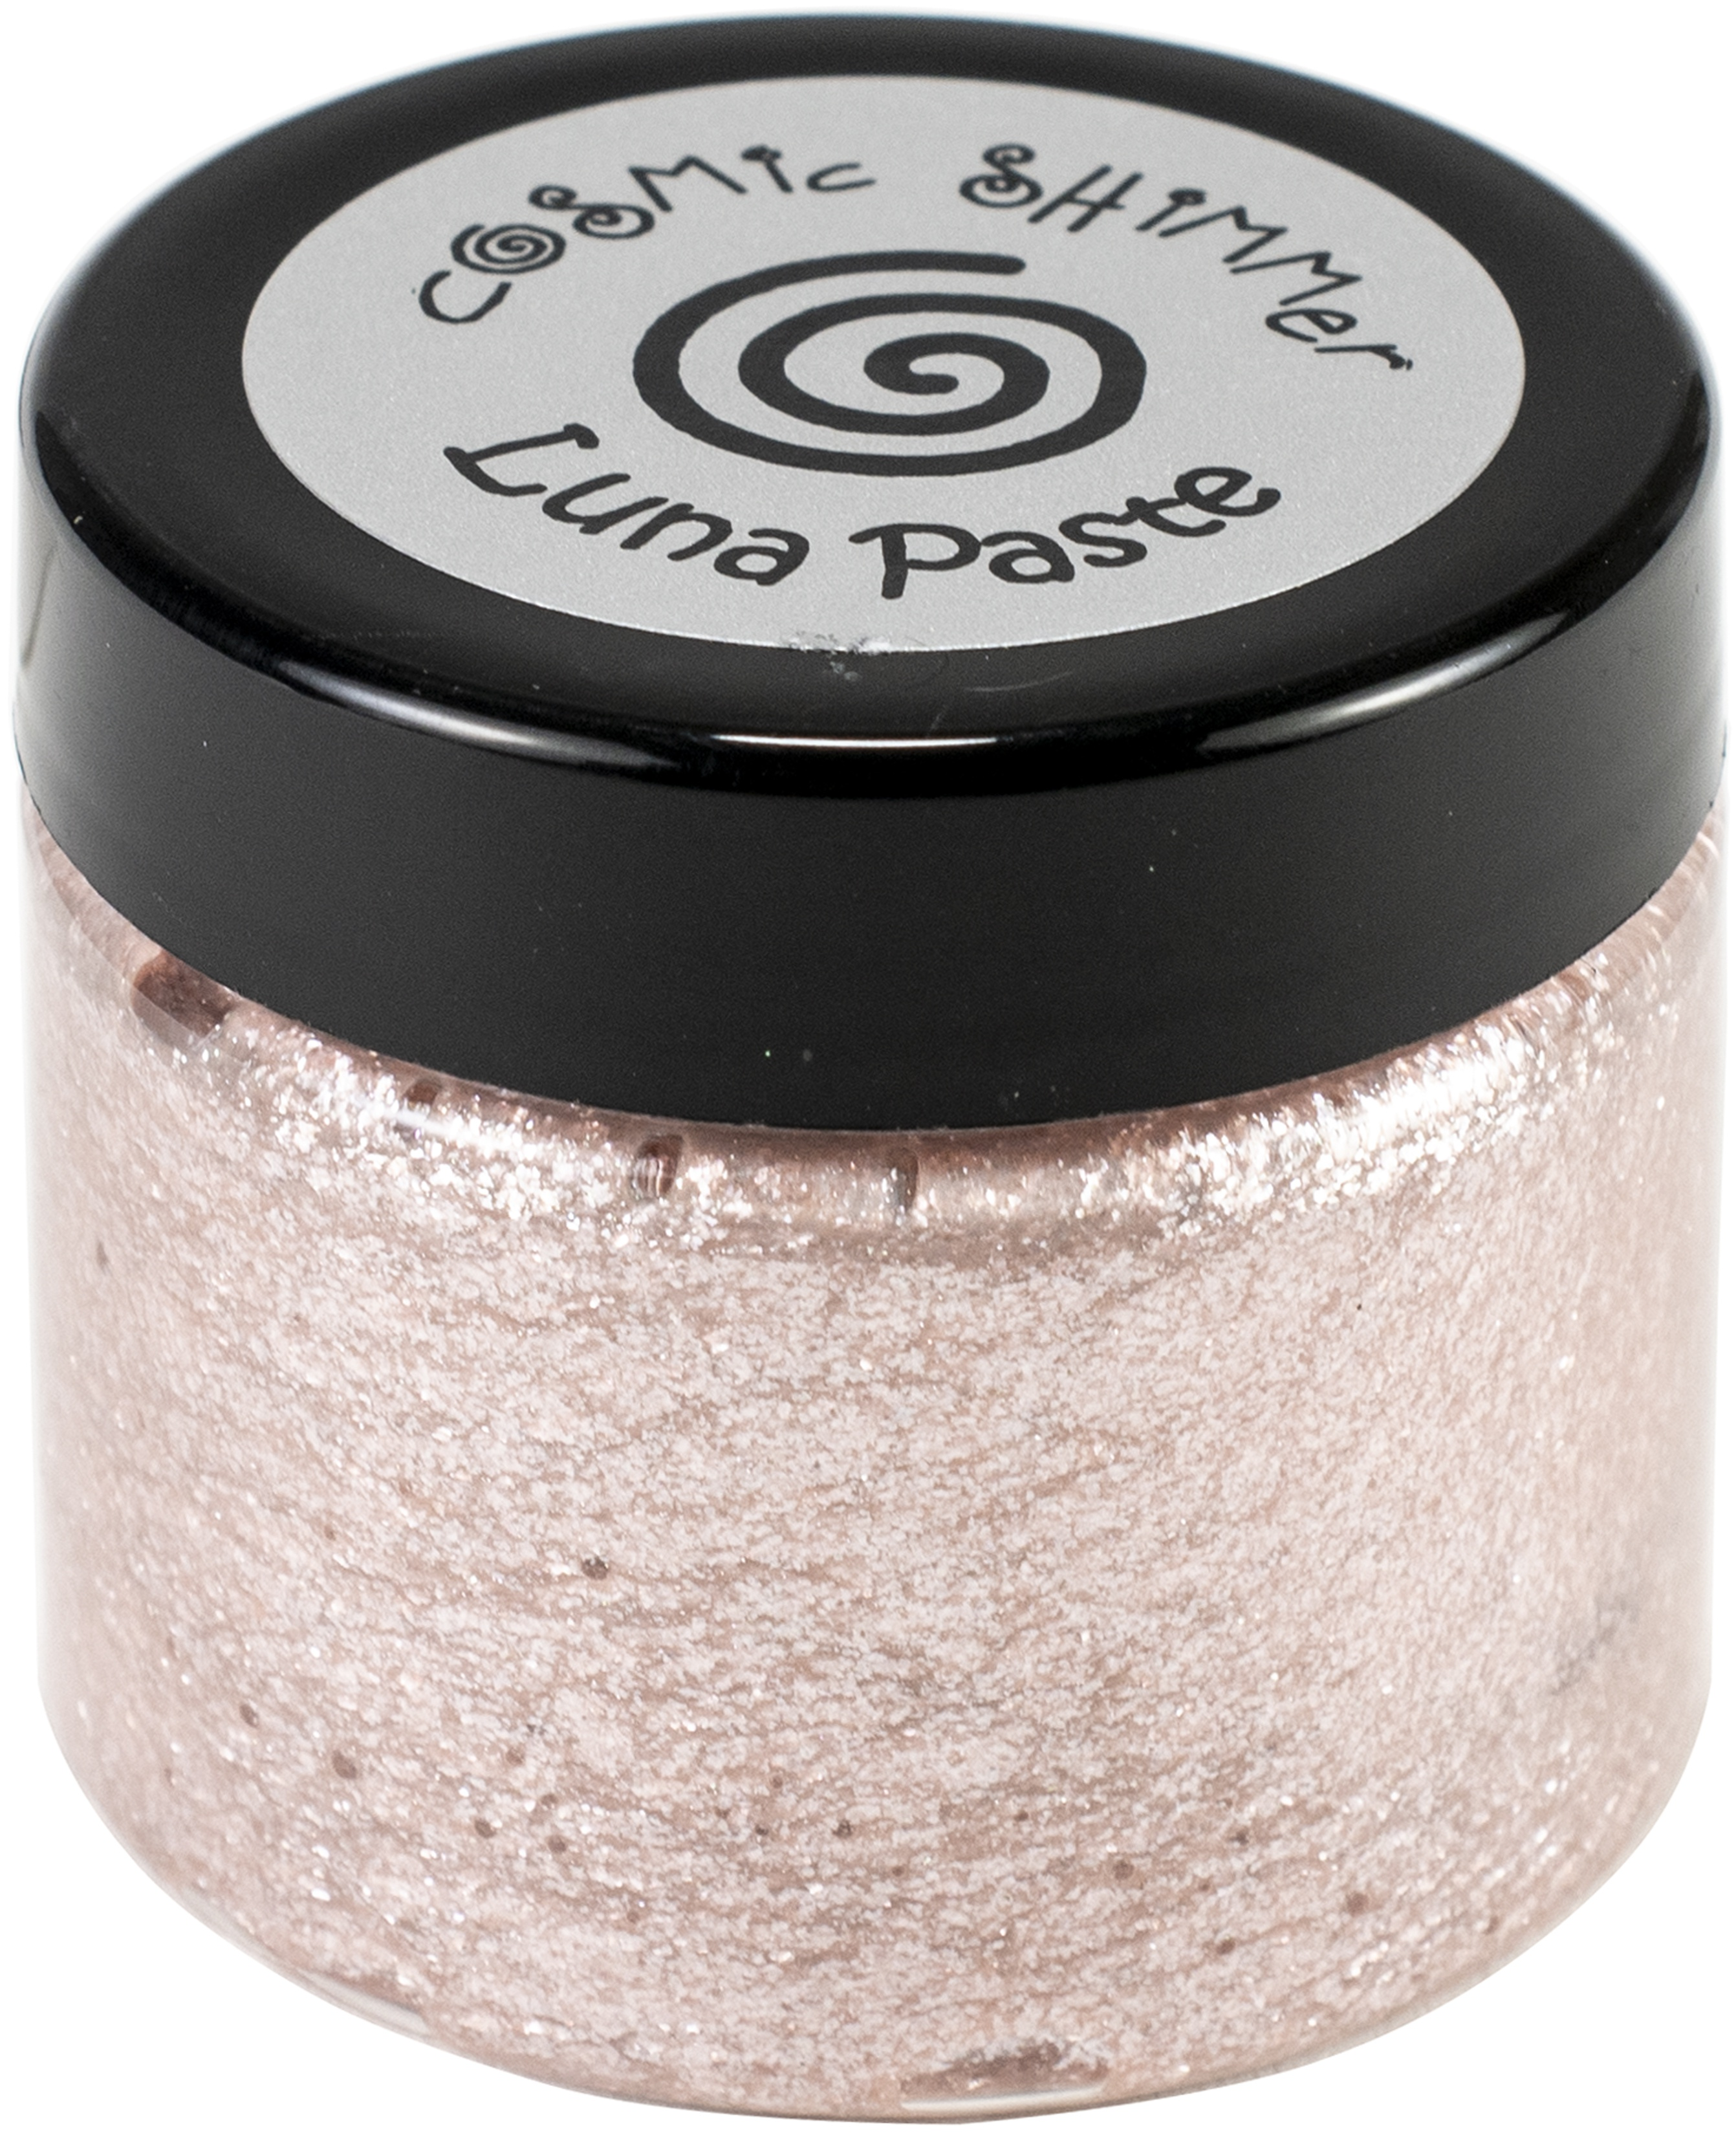 Cosmic Shimmer Luna Paste-Moonlight Rose